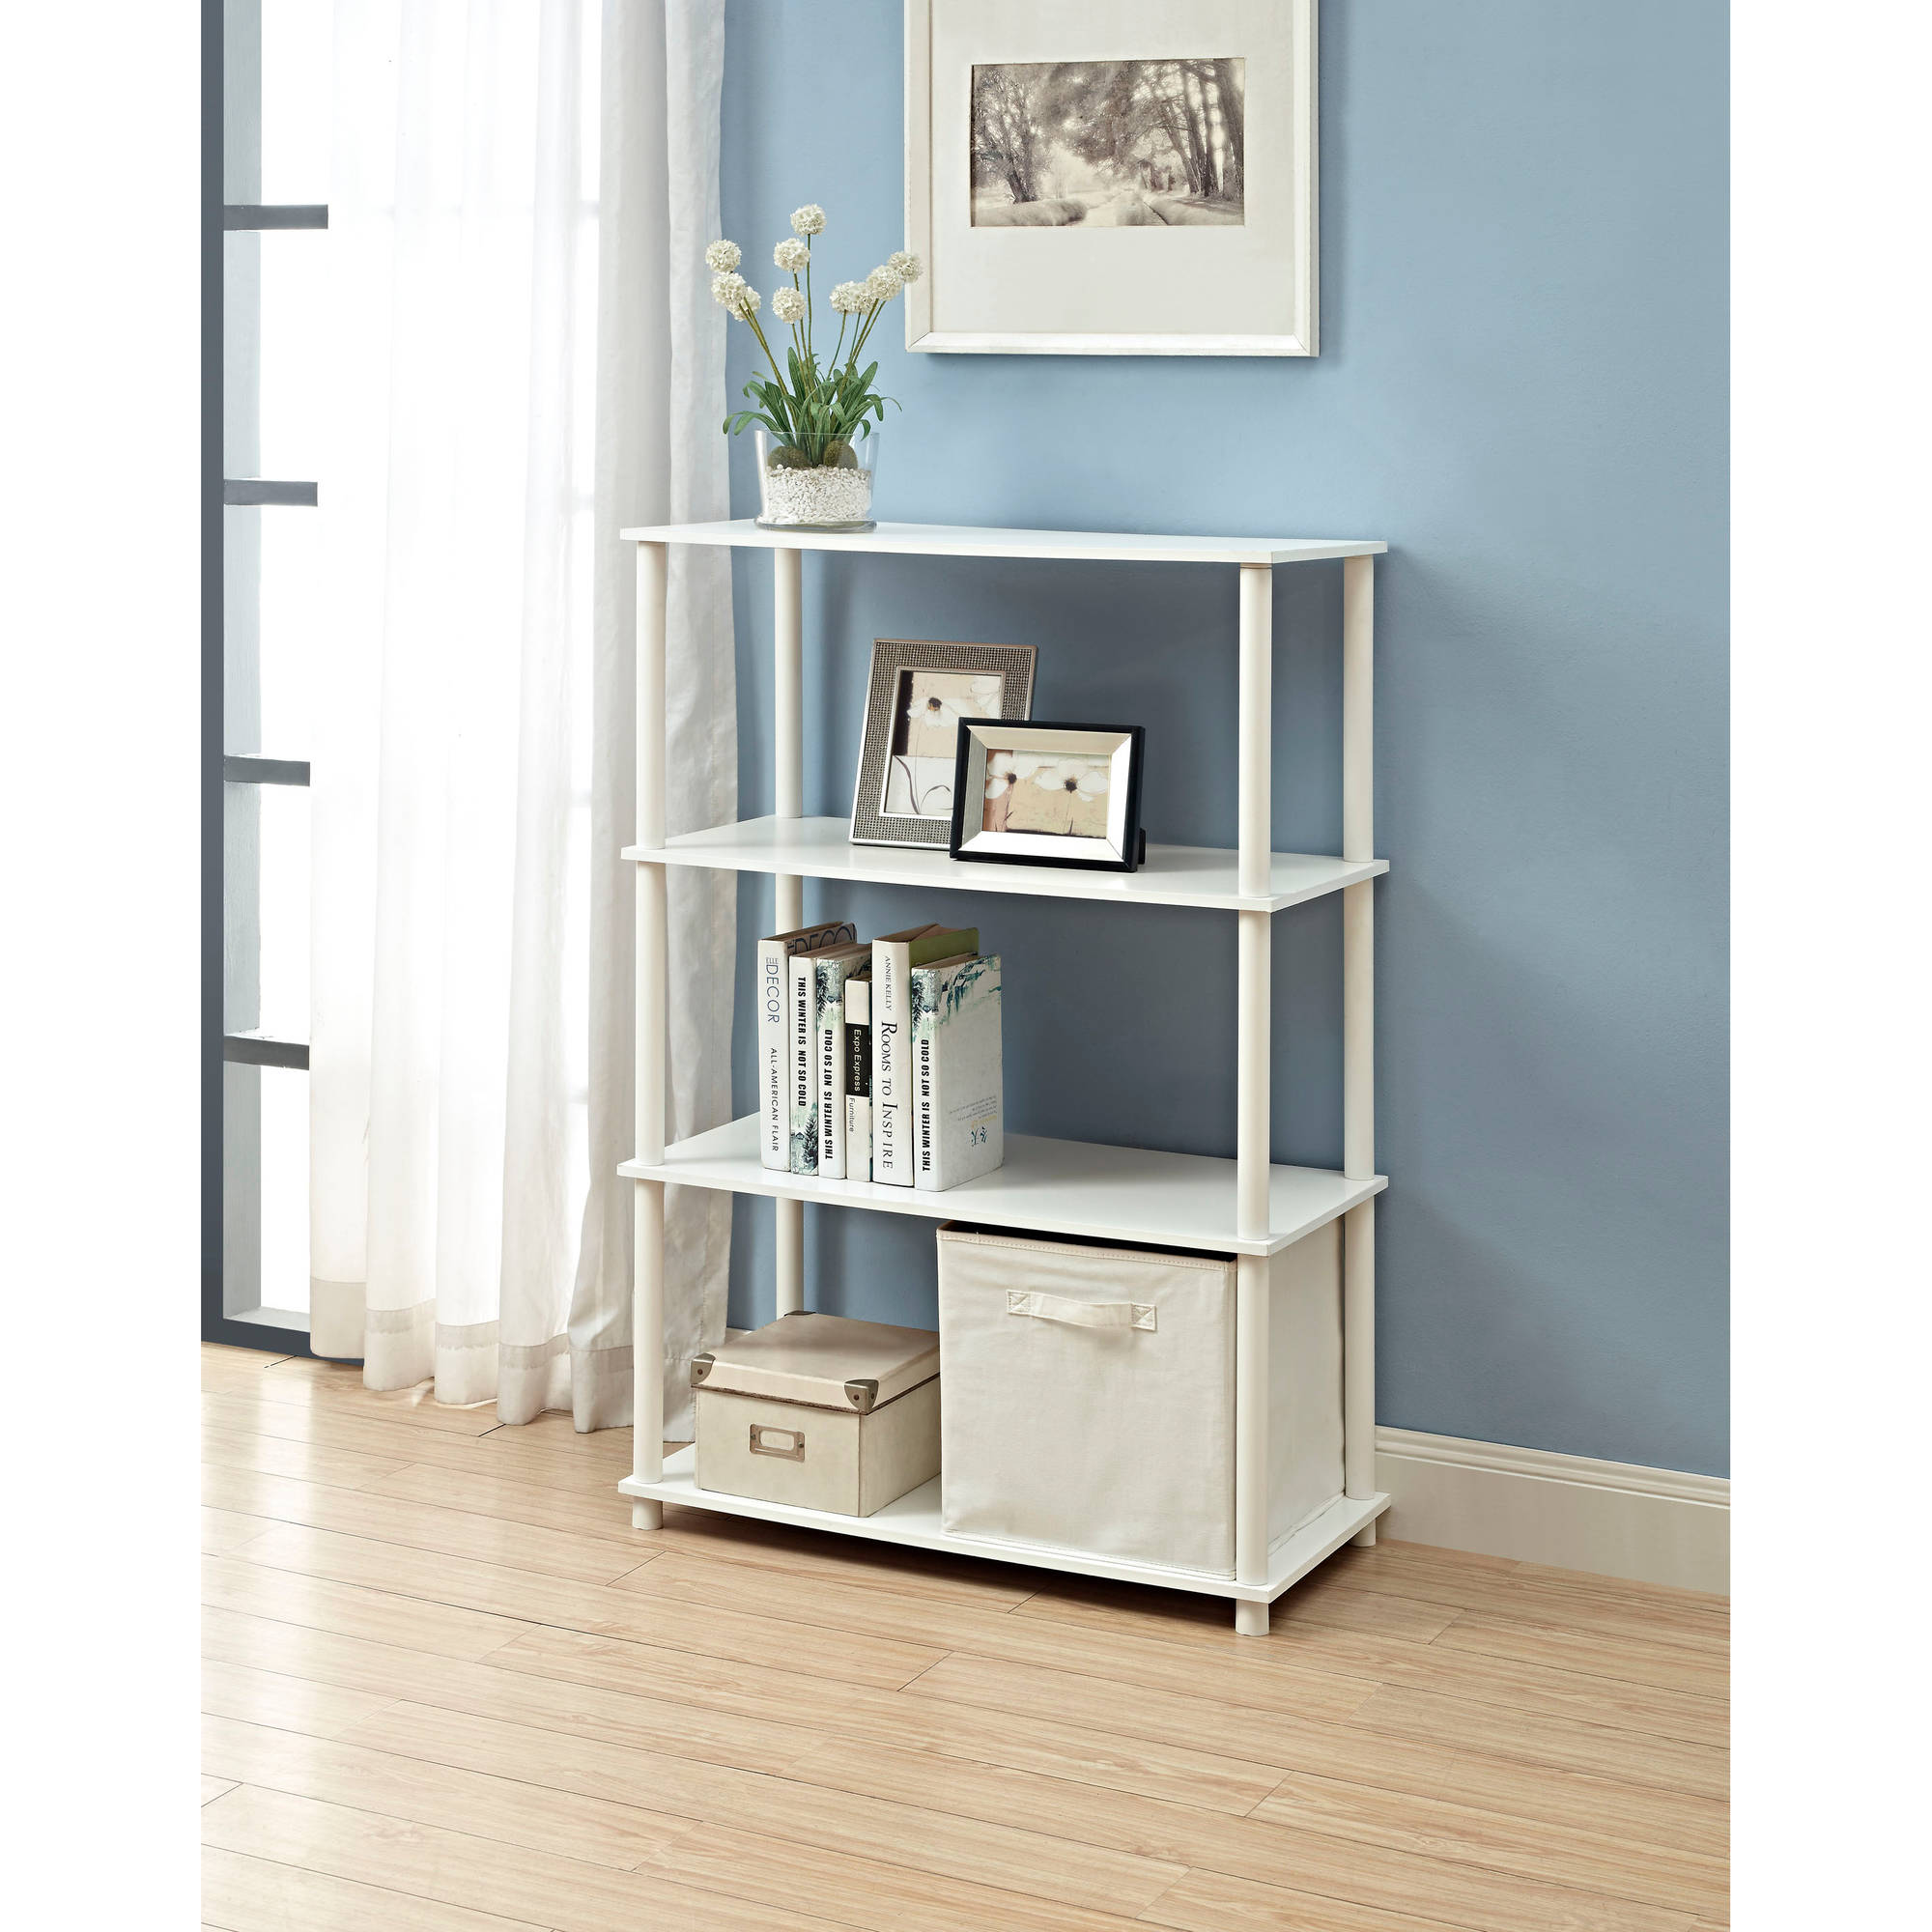 Mainstays No Tools 6-Cube Storage Shelf, Multiple Colors